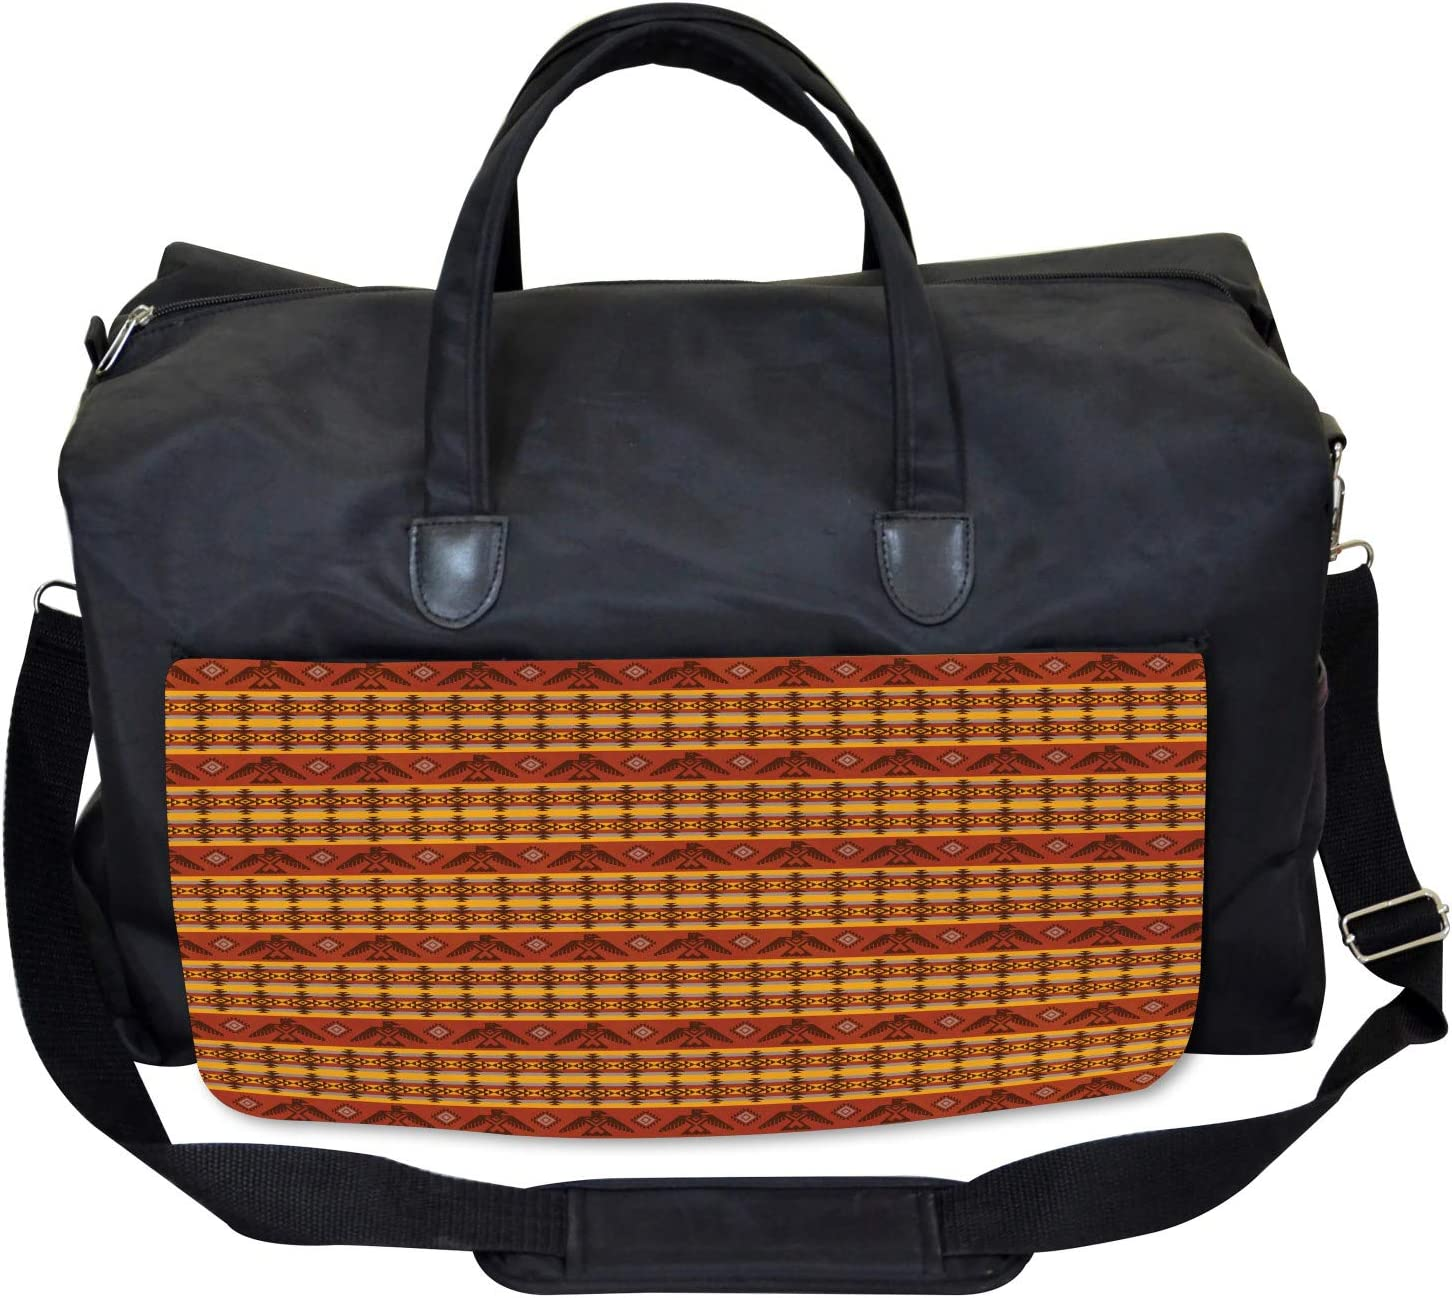 Large Weekender Carry-on Ambesonne Tribal Gym Bag Indigenous Motifs